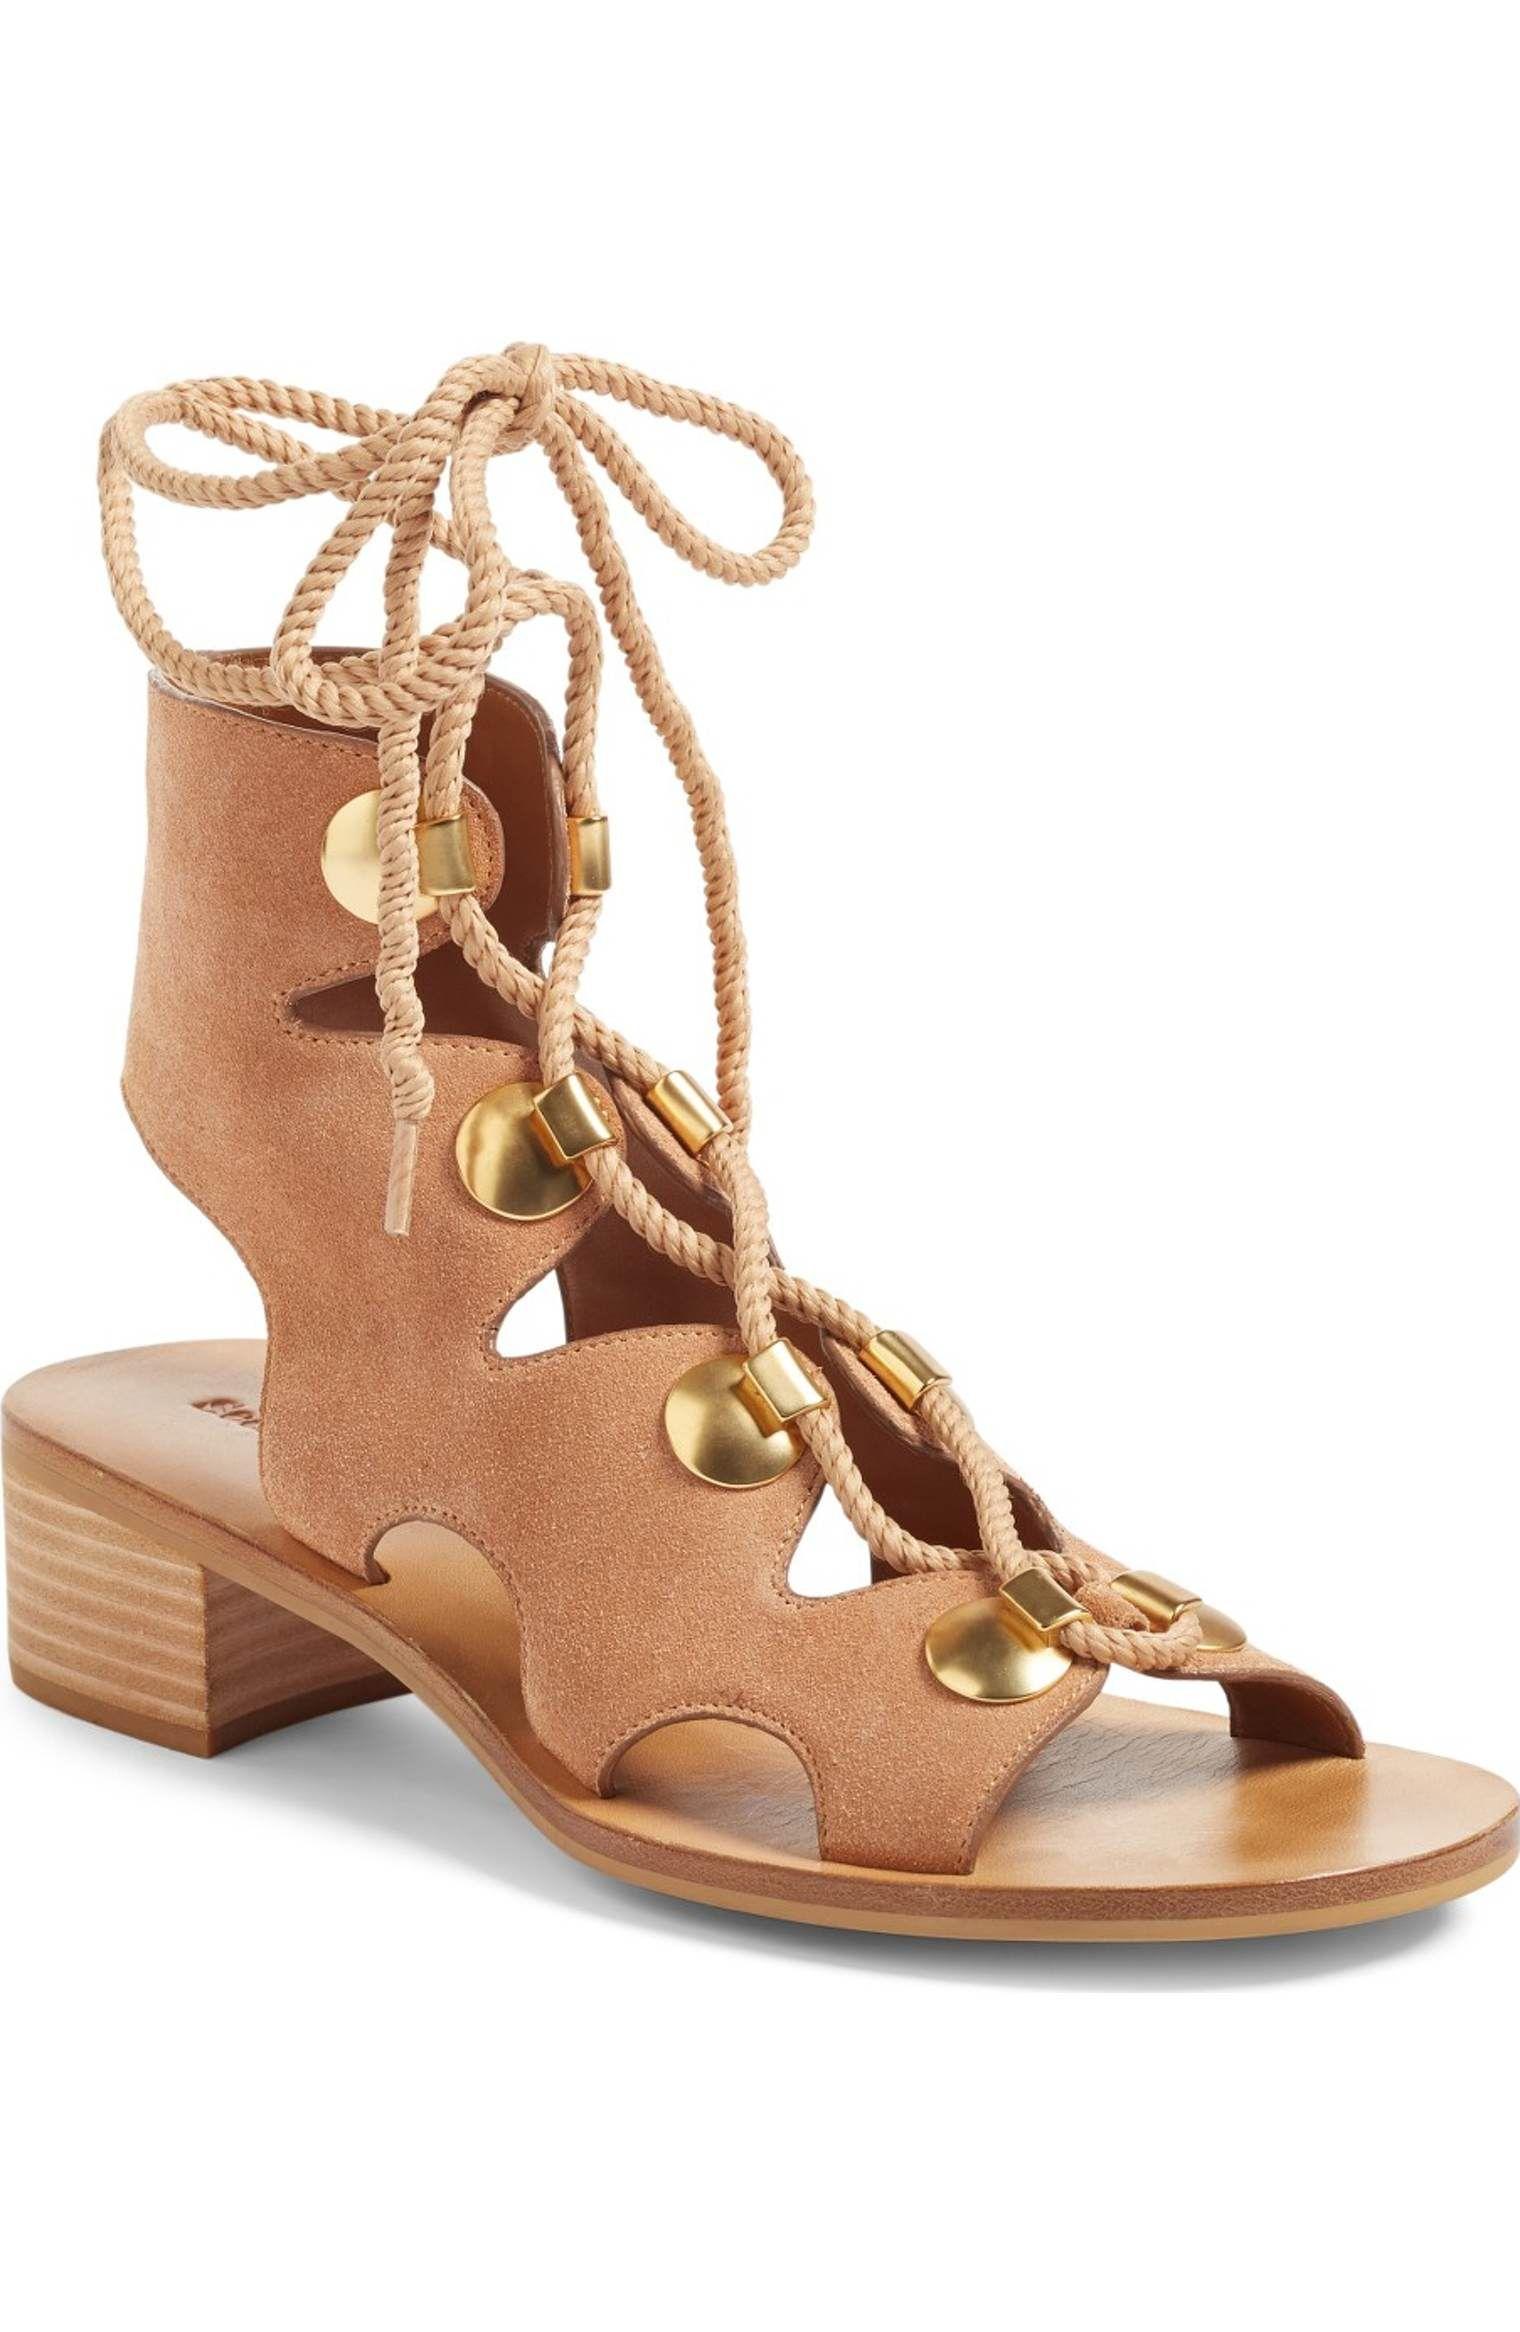 Chloé Edna flat sandals OWuvLaOy1